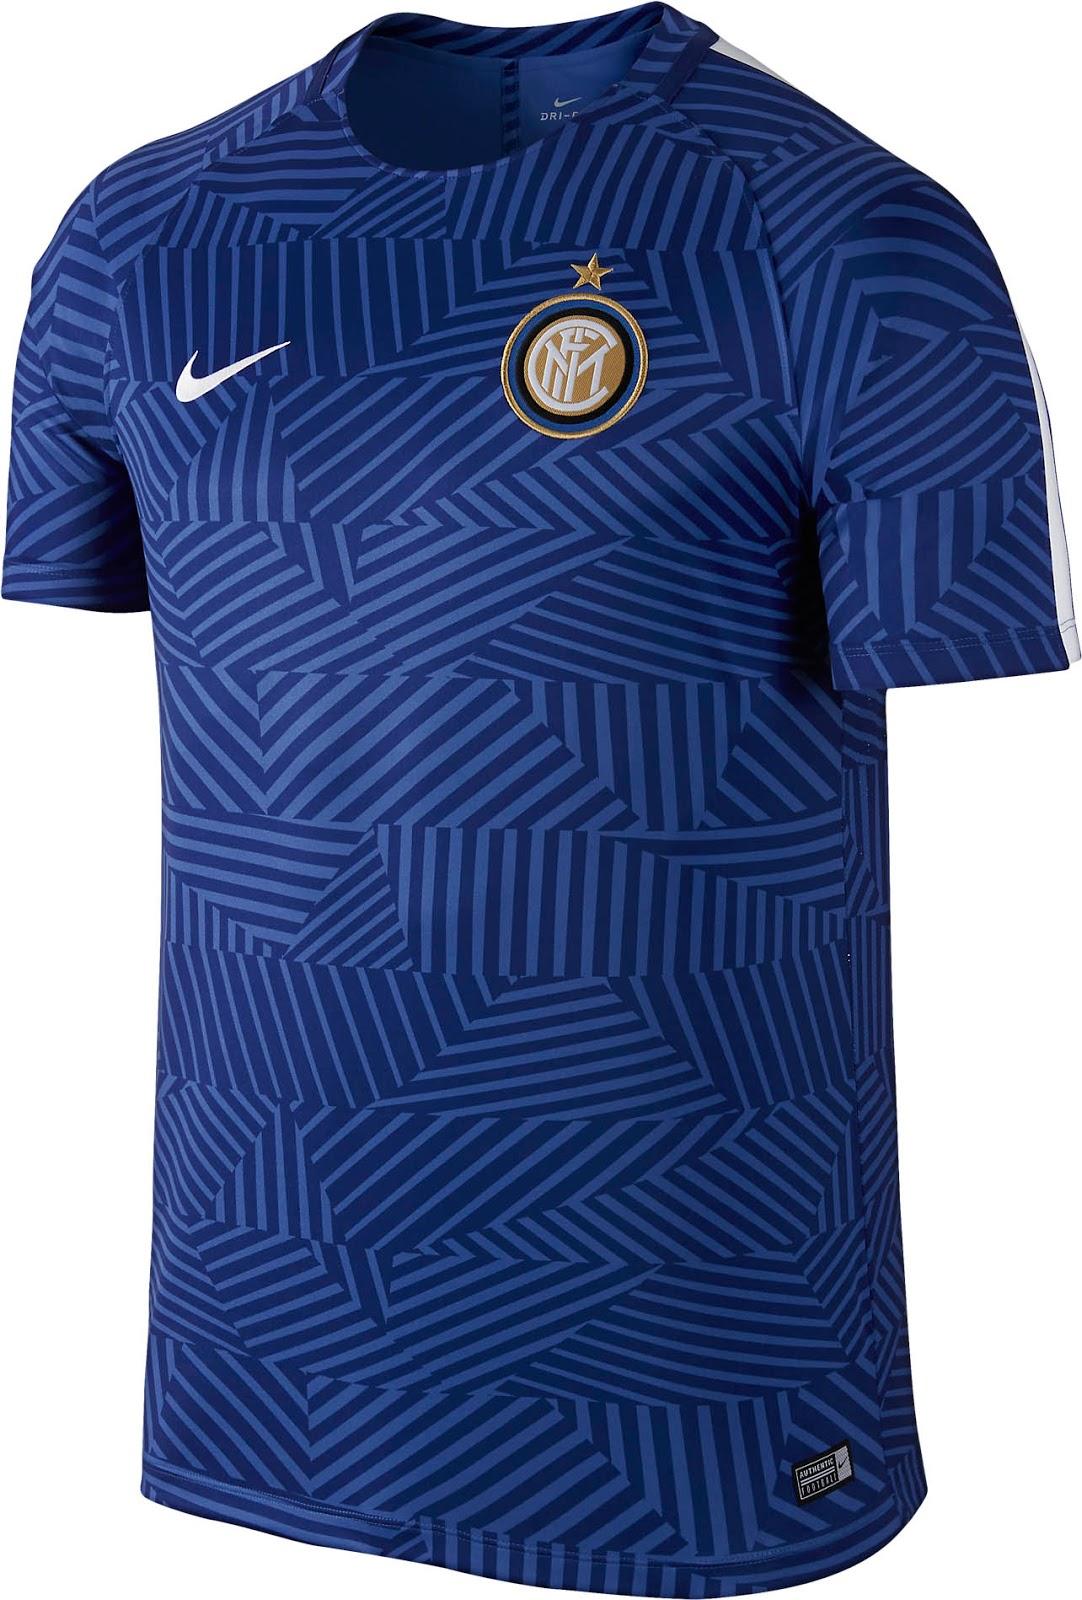 vans u noir authentique - Inter 16-17 Pre-Match Shirt Released - Footy Headlines